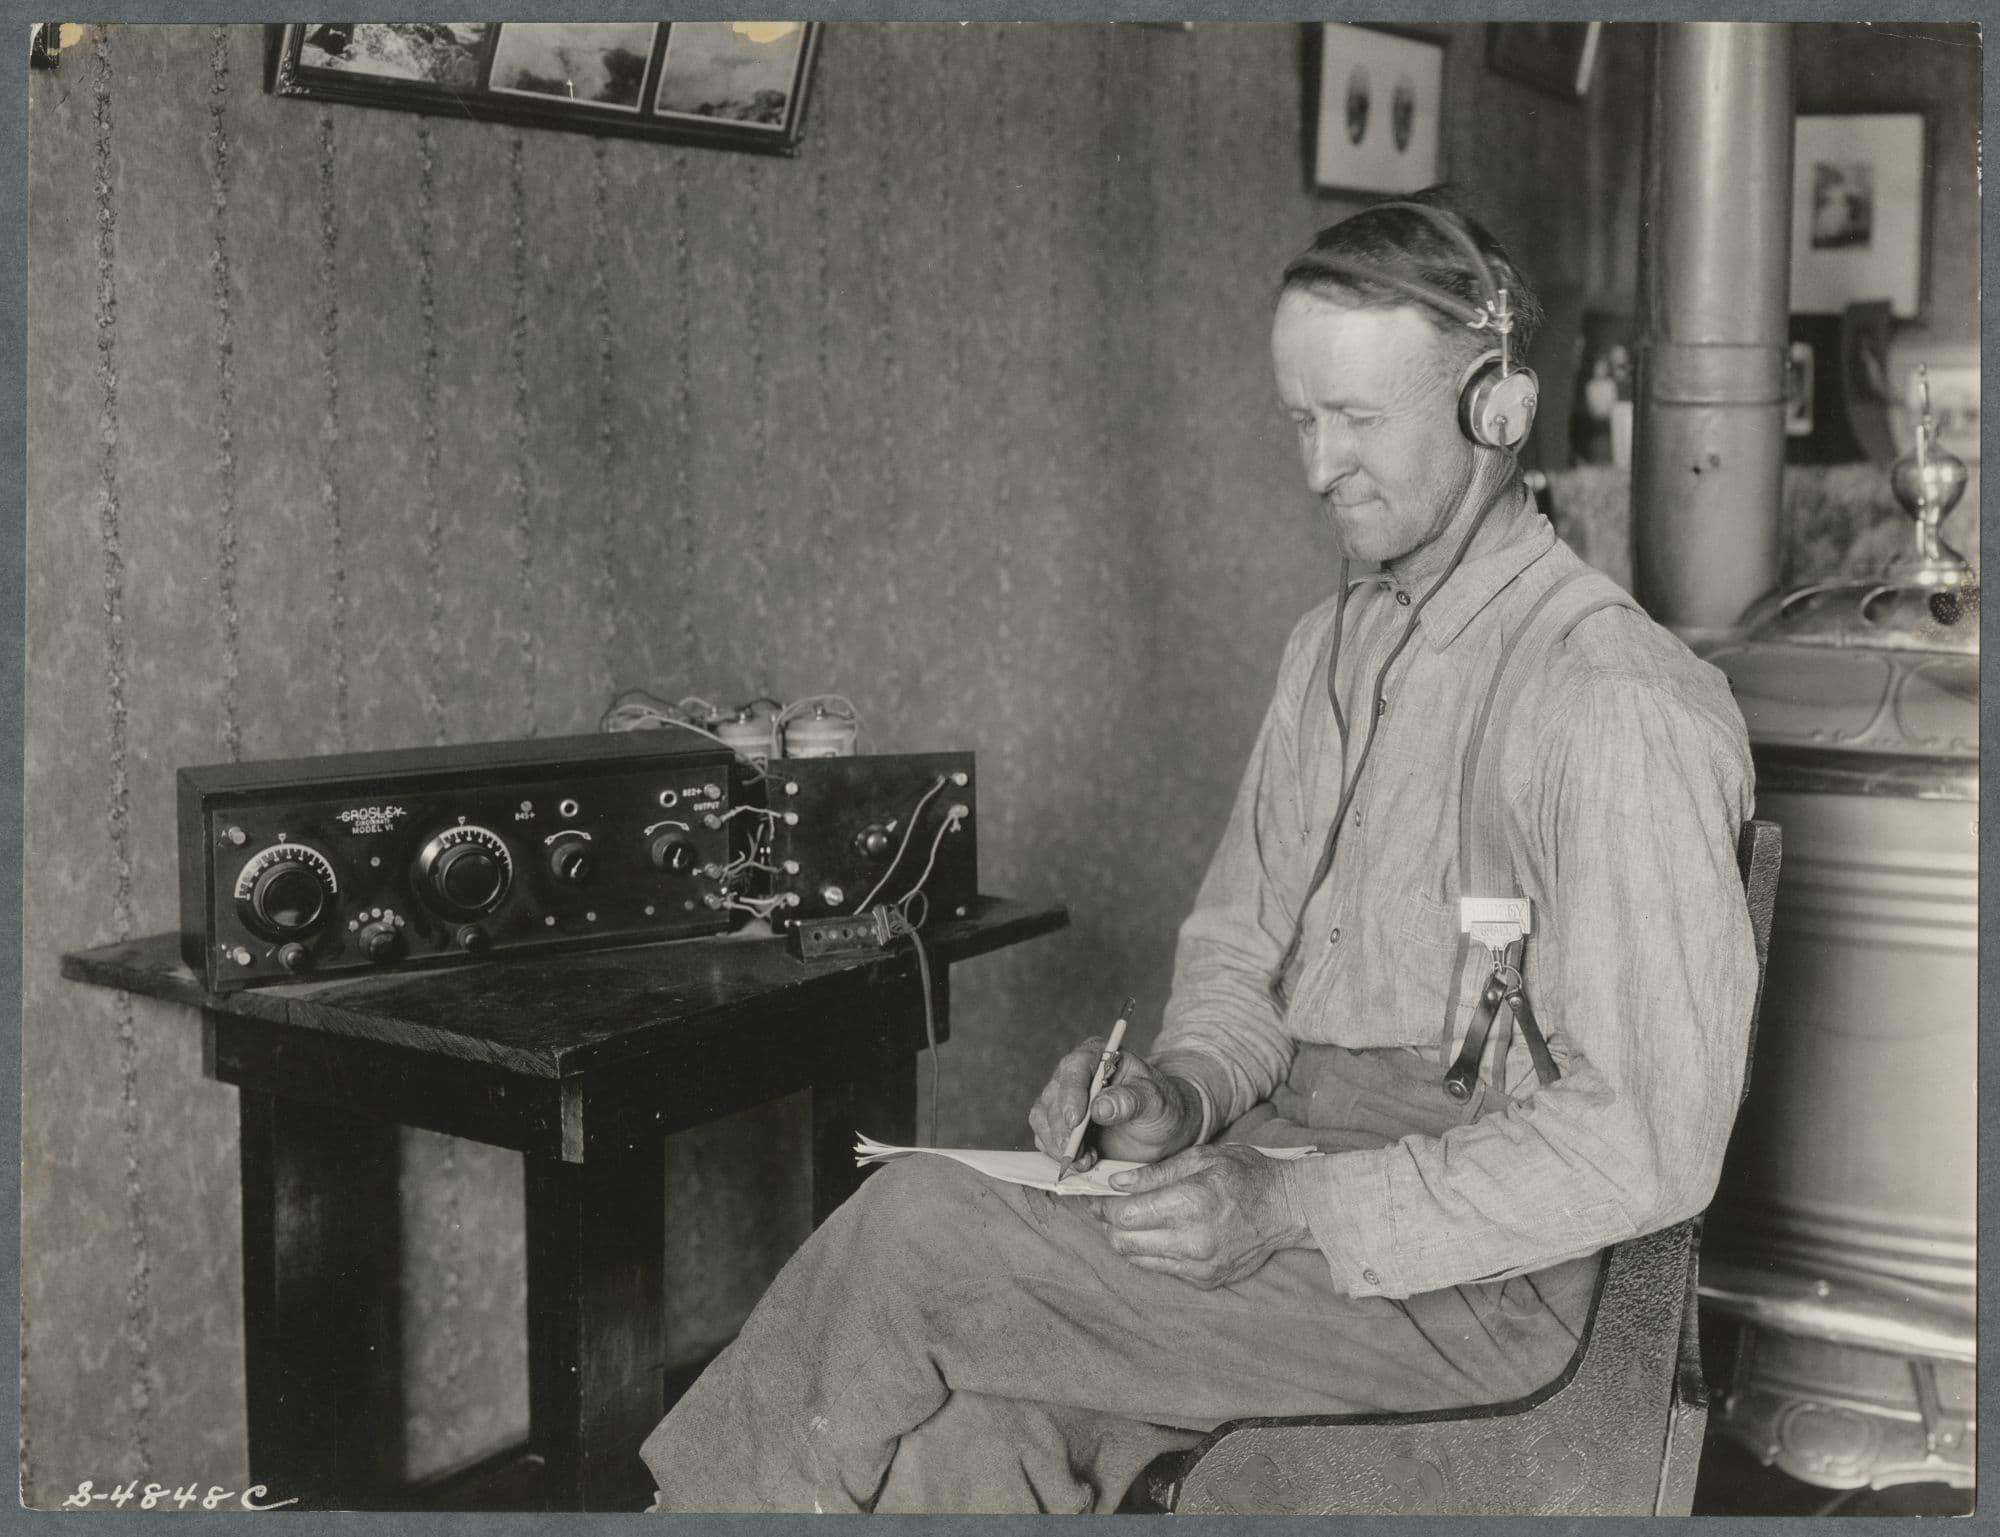 Farmer listening to KOAC